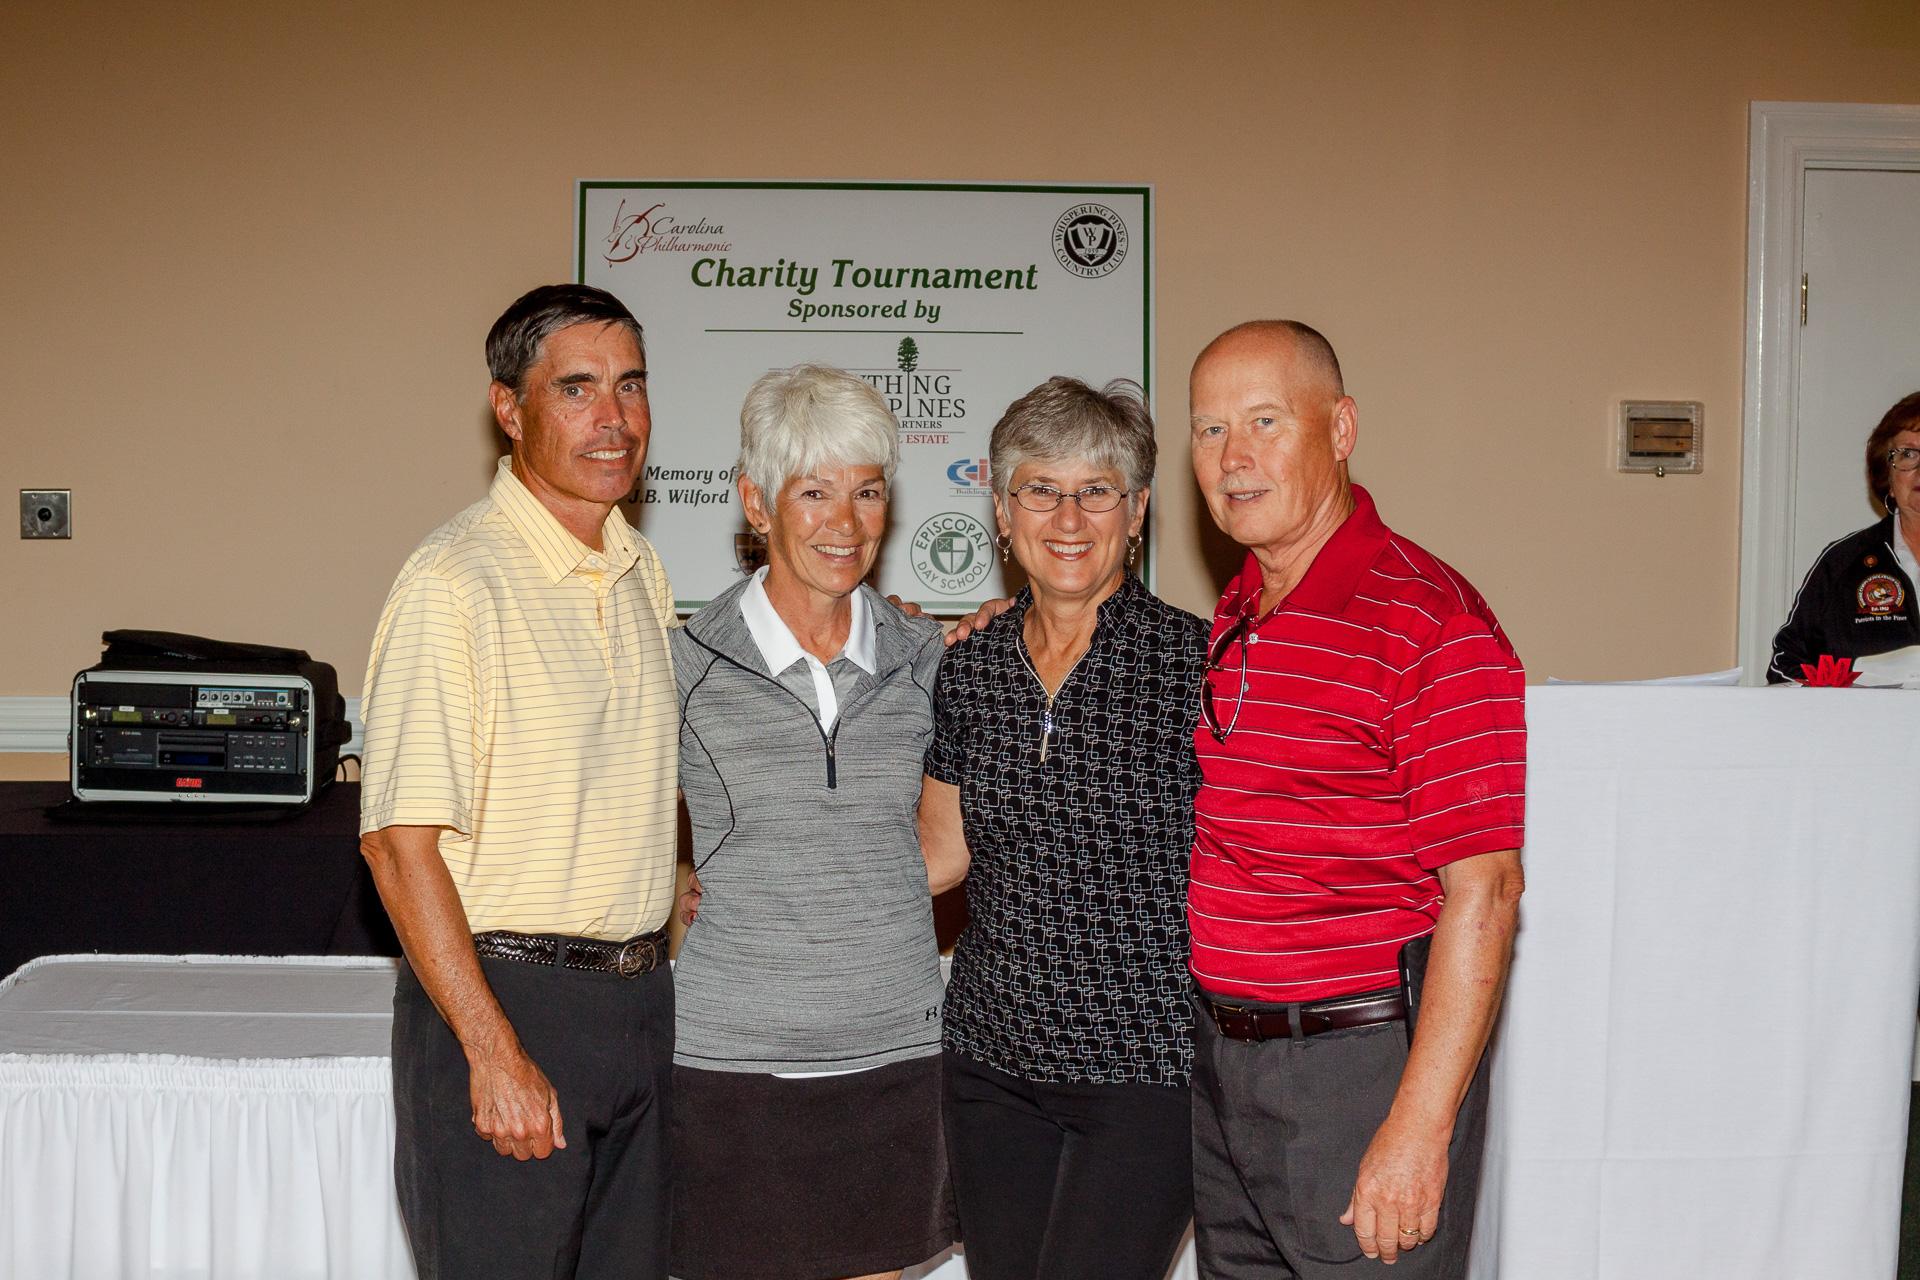 Kirk Velett, Laurie Velett, Jane Asdal and Bob Asdal were the tournament champions last year!